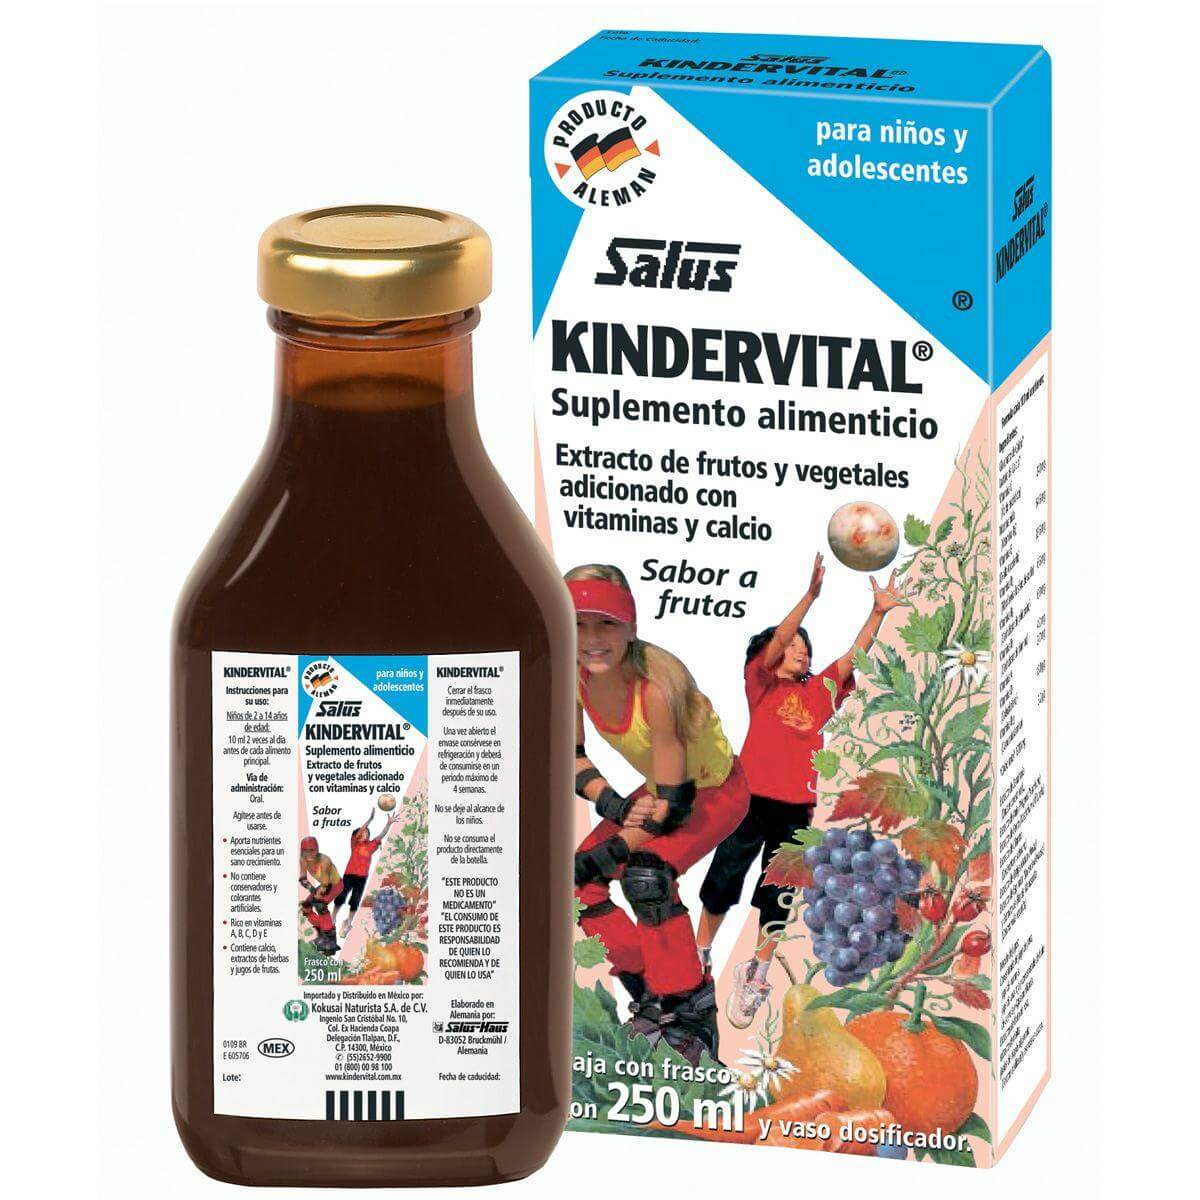 Power Health Floradix Kindervital Απαραίτητο Συμπλήρωμα Διατροφής Για την Ανάπτυξη των Παιδιών 250ml